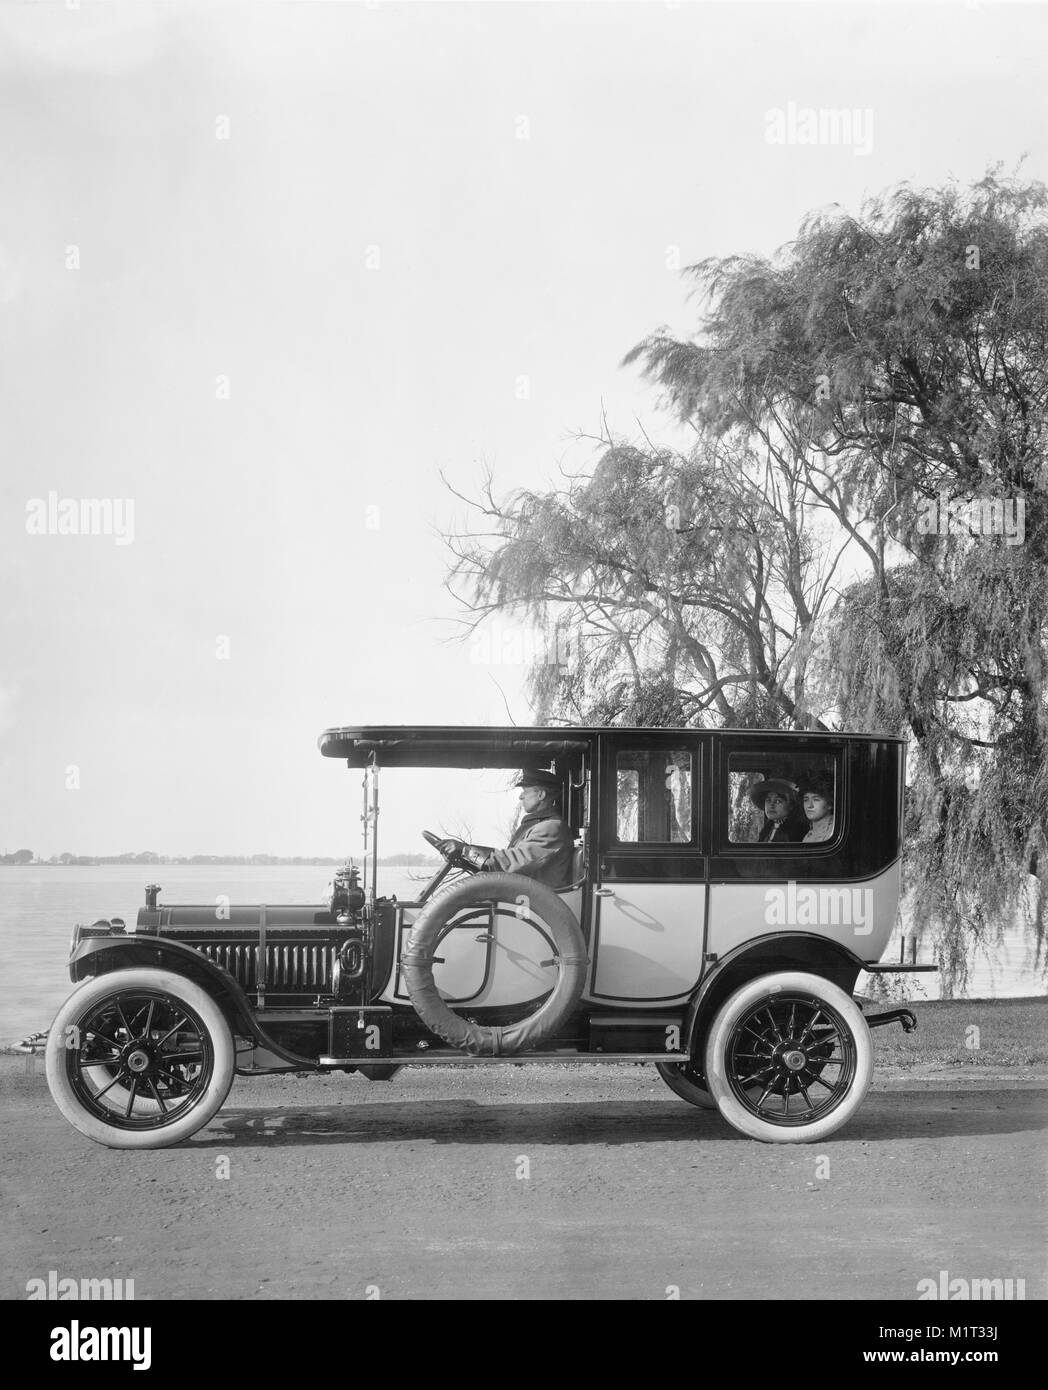 Packard Motor Car Company Stock Photos & Packard Motor Car Company ...